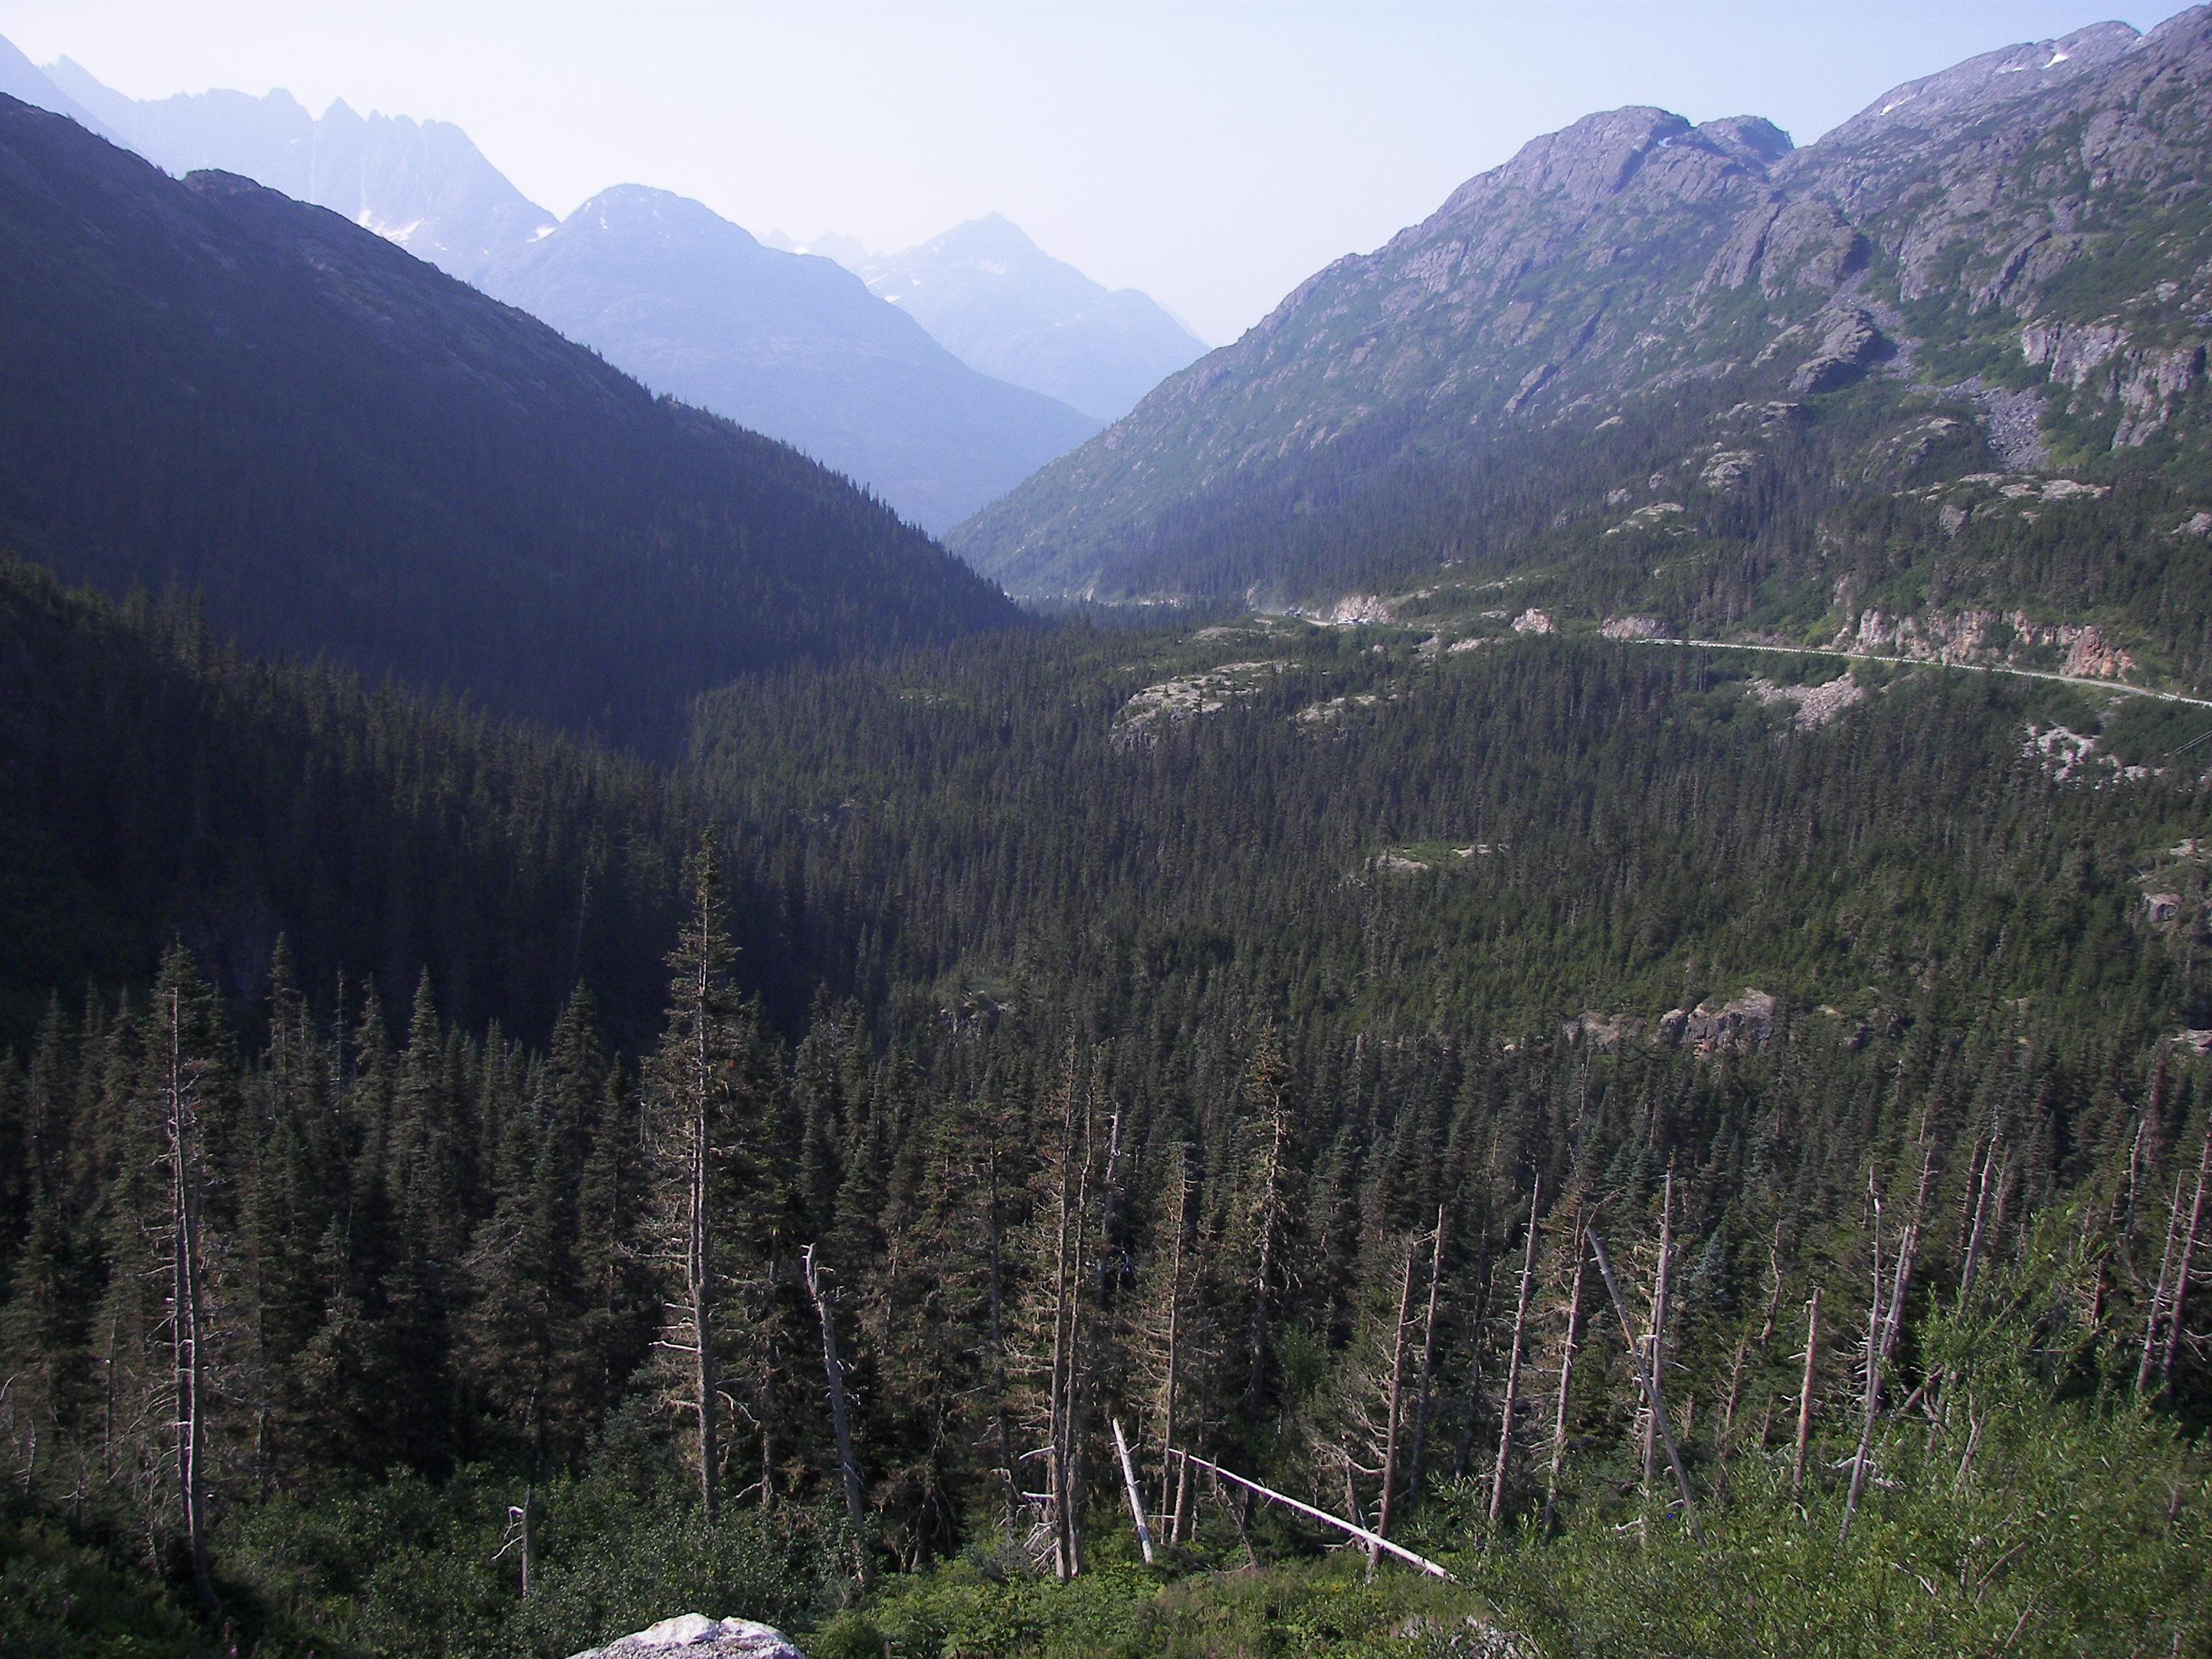 File:White Pass, Alaska.jpg - Wikipedia